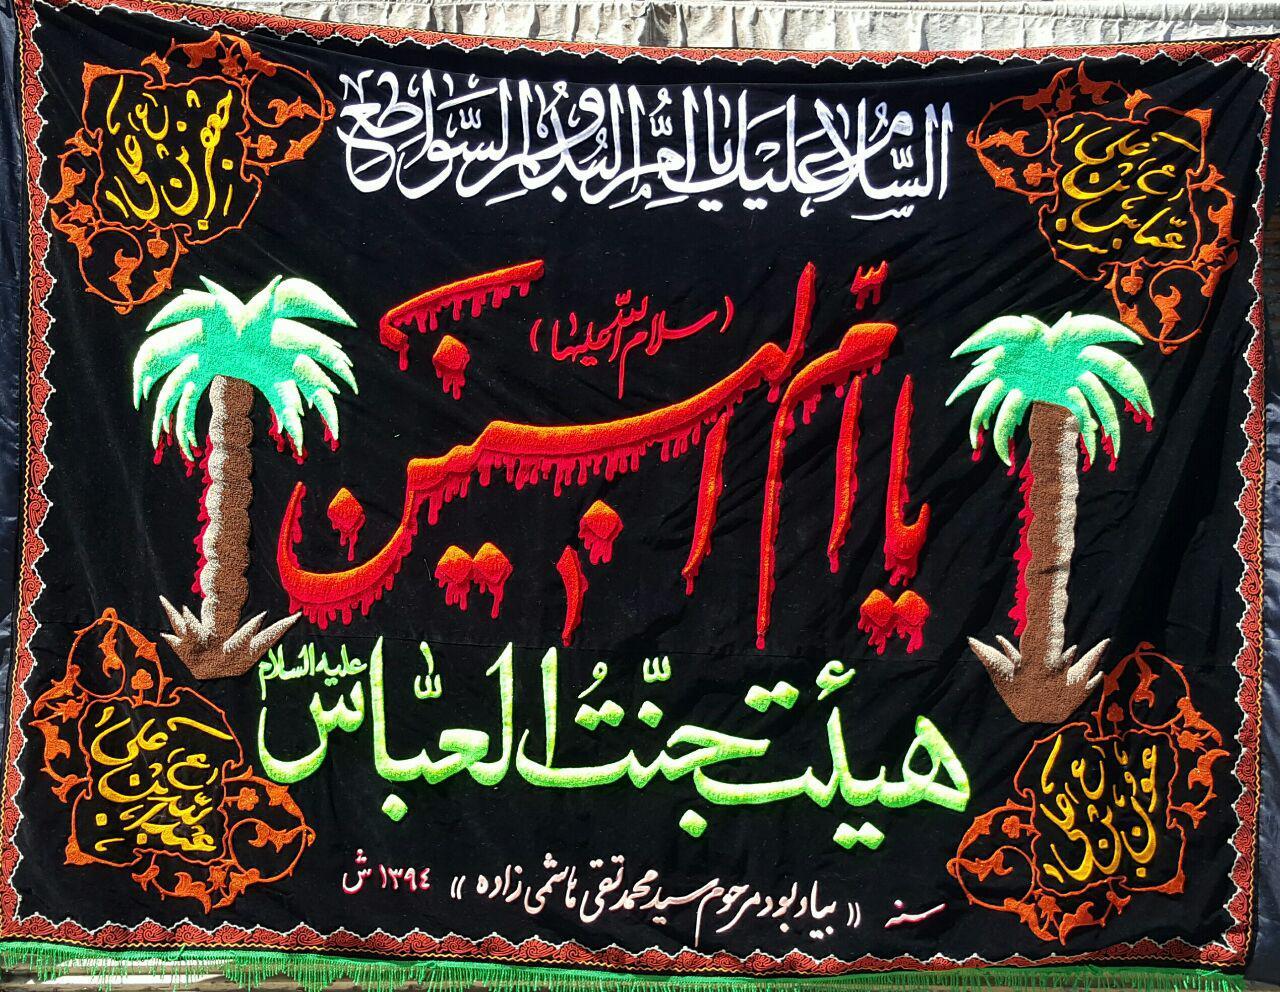 photo 2016 09 03 09 12 31 %پرچم دوزی الزهرا اصفهان